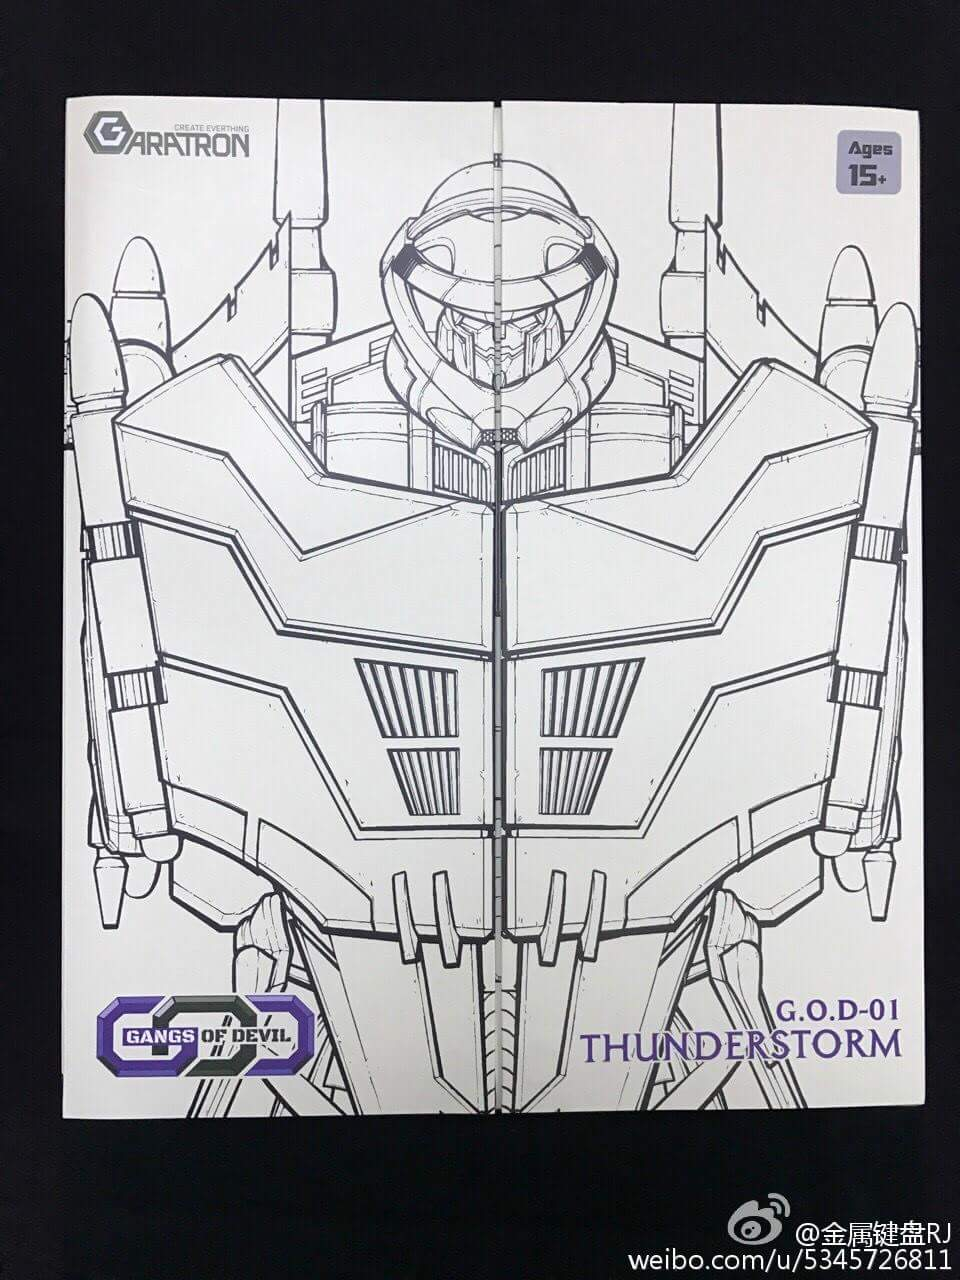 [Garatron] Produit Tiers - Gand of Devils G.O.D-01 Thunderstorm - aka Thunderwing des BD TF d'IDW Tgwcybqf